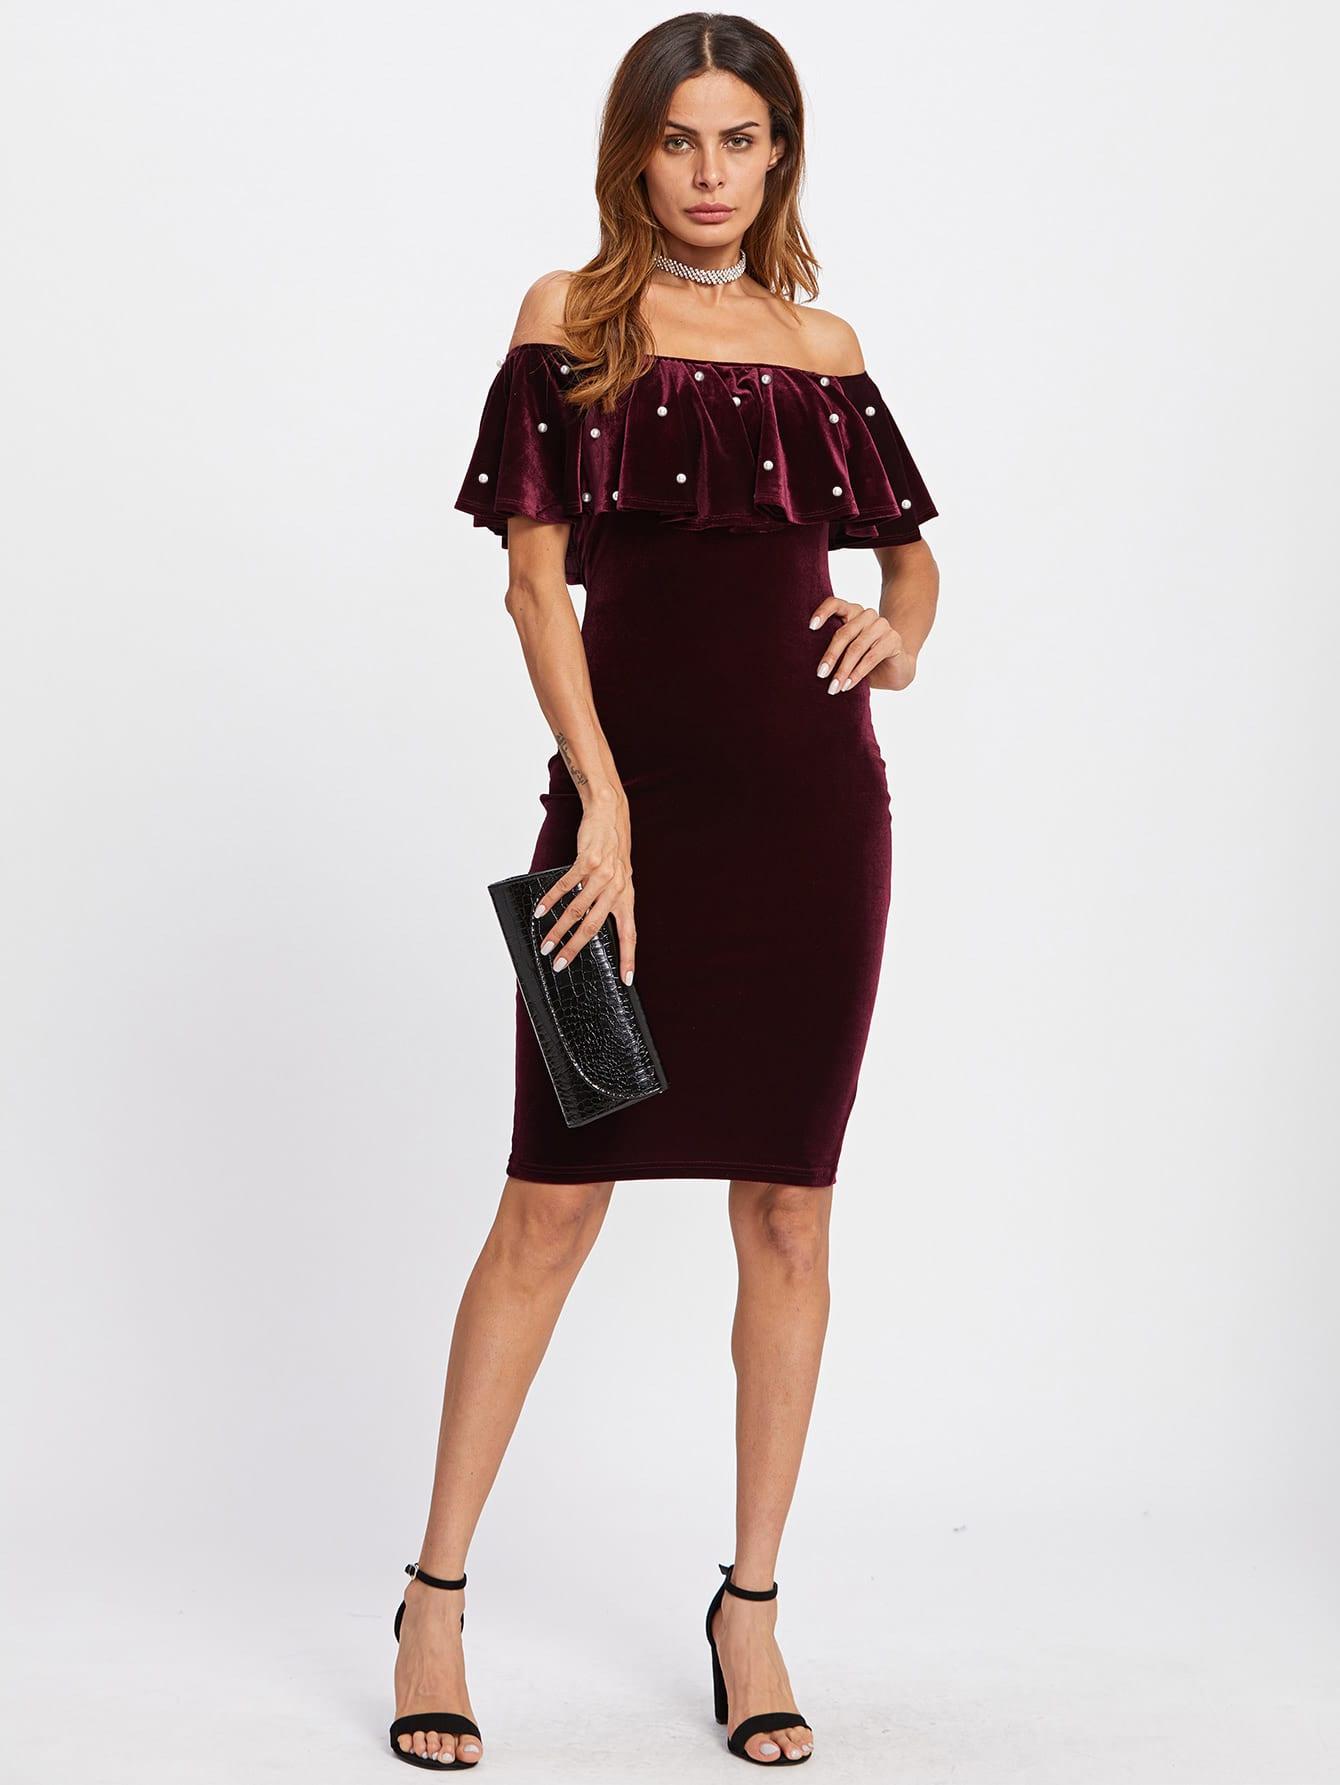 Pearl Detail Frill Off Shoulder Dress dress170918708